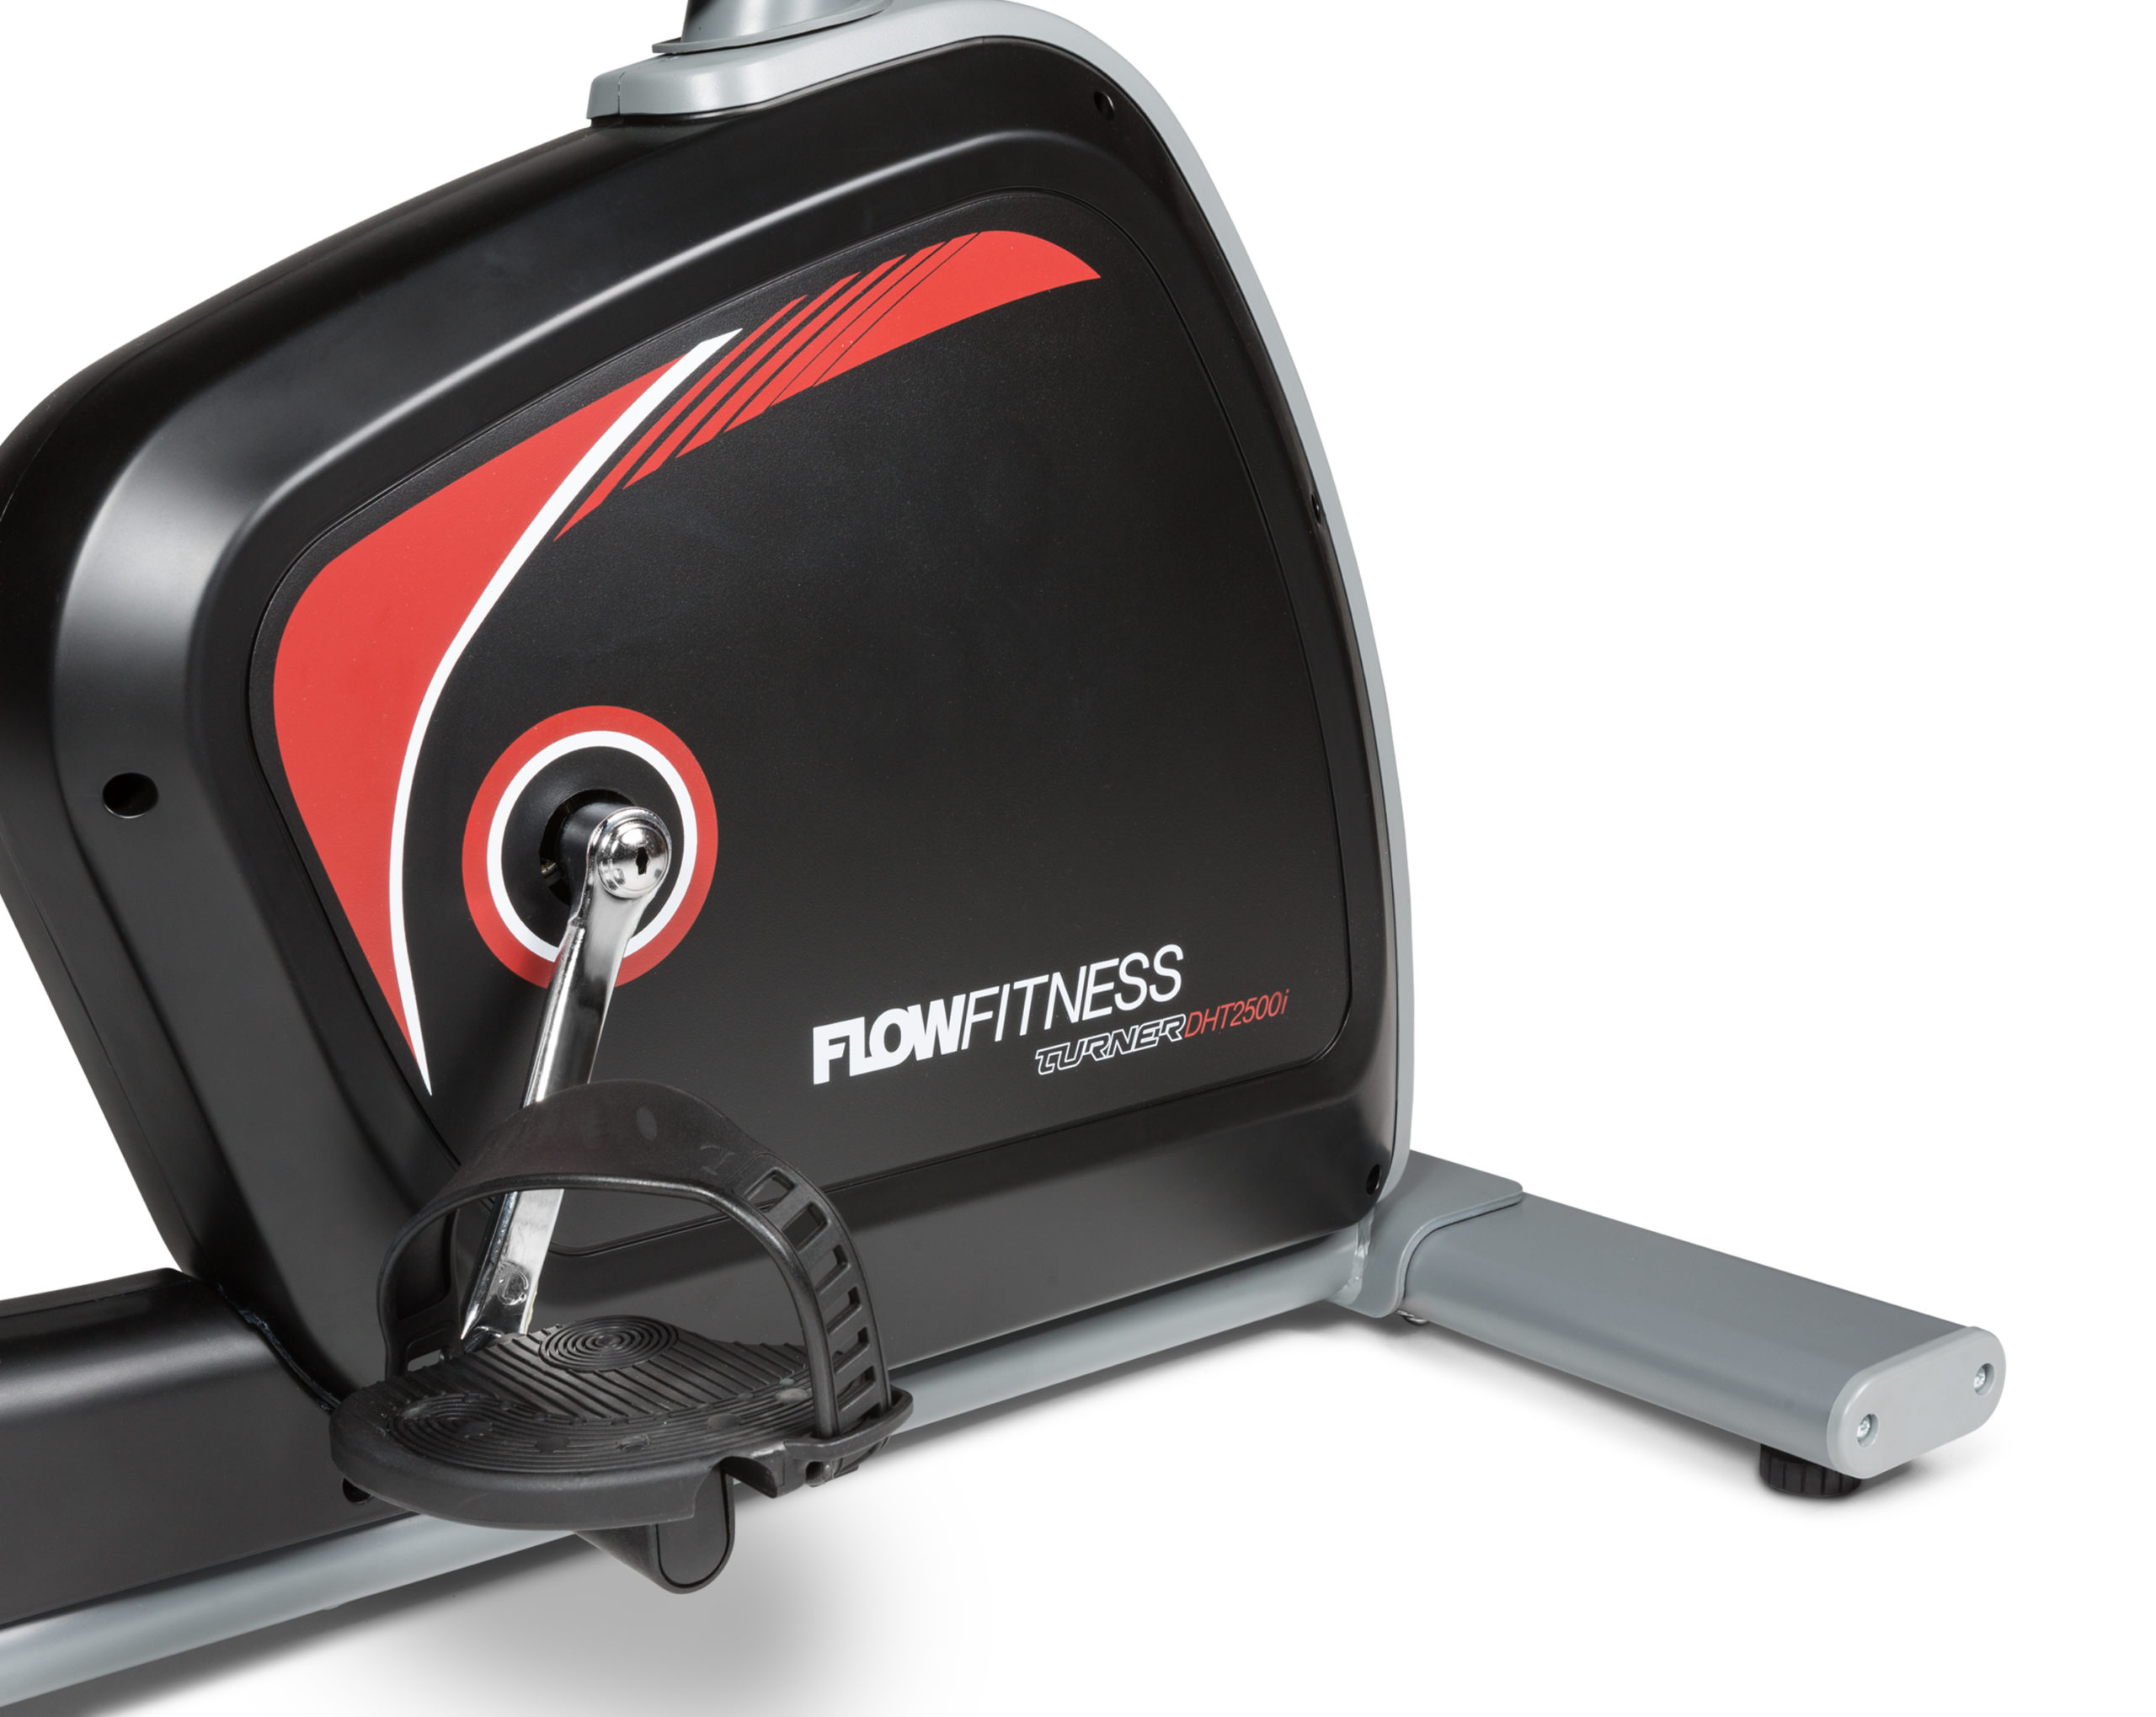 Flow Fitness Tabel Turner DHT2500i Hometrainer 2